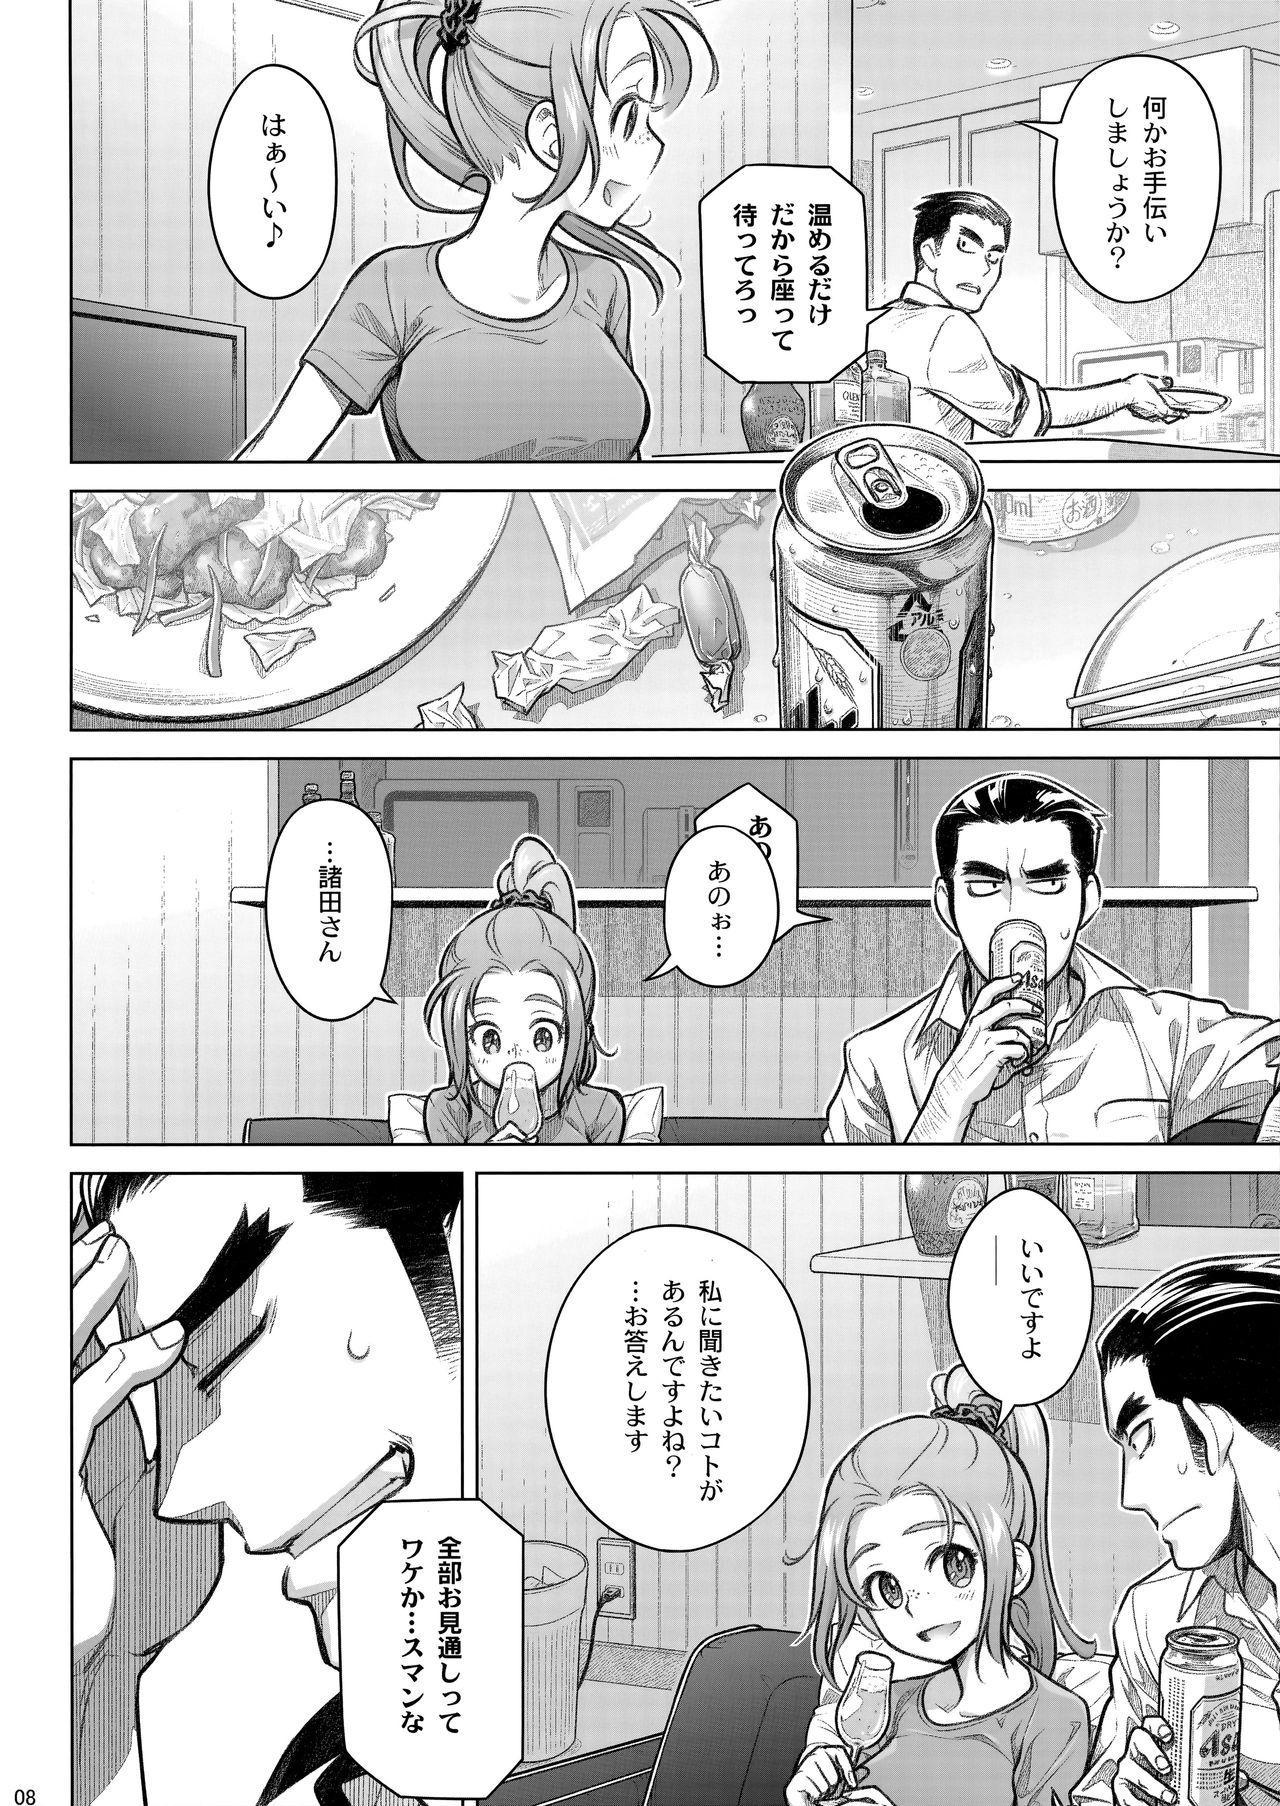 Sorako no Tabi 8 7